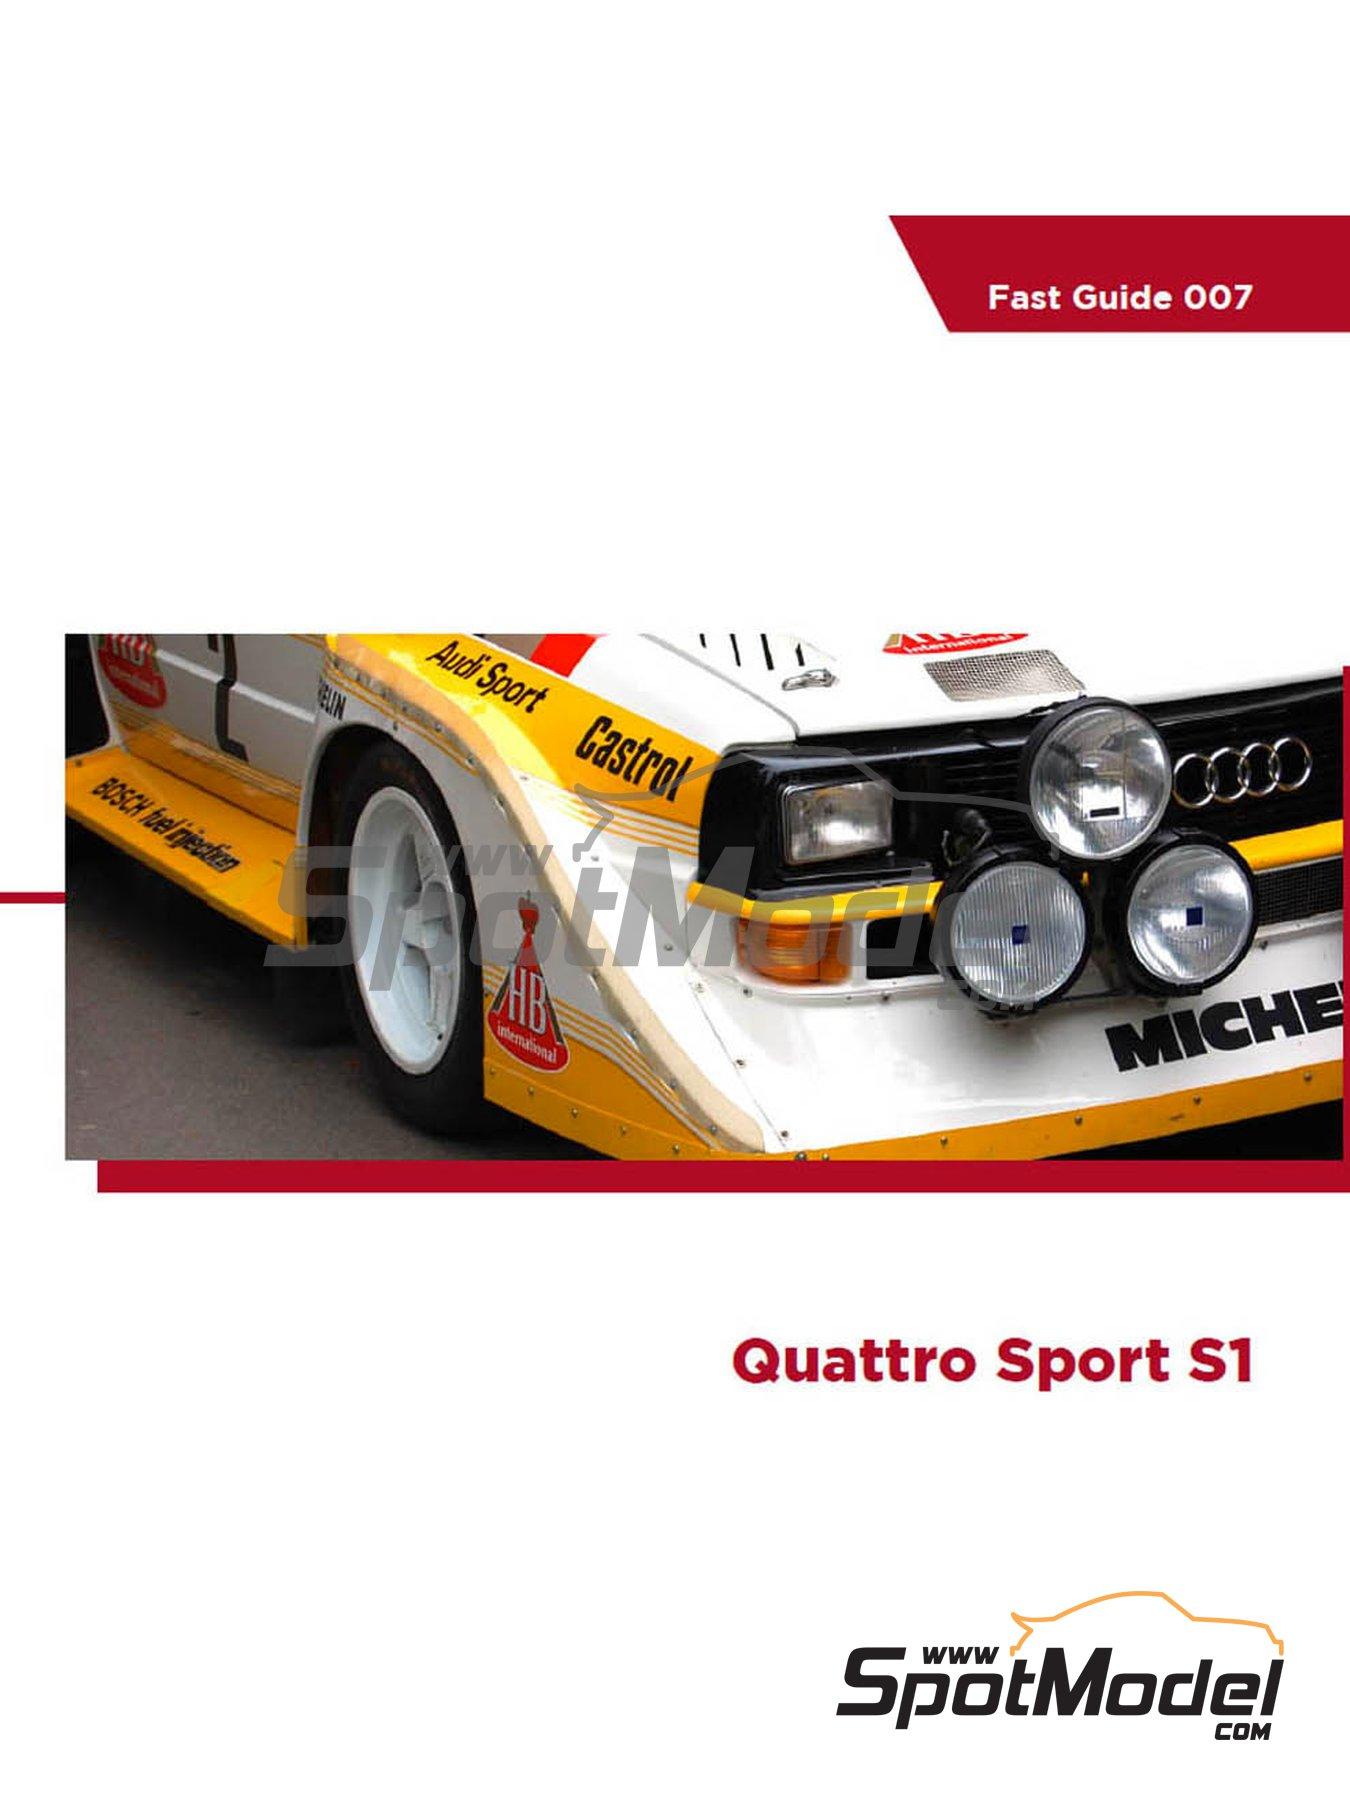 Audi Quattro Sport S1 | Reference / walkaround book manufactured by Komakai (ref.KOM-FG007) image